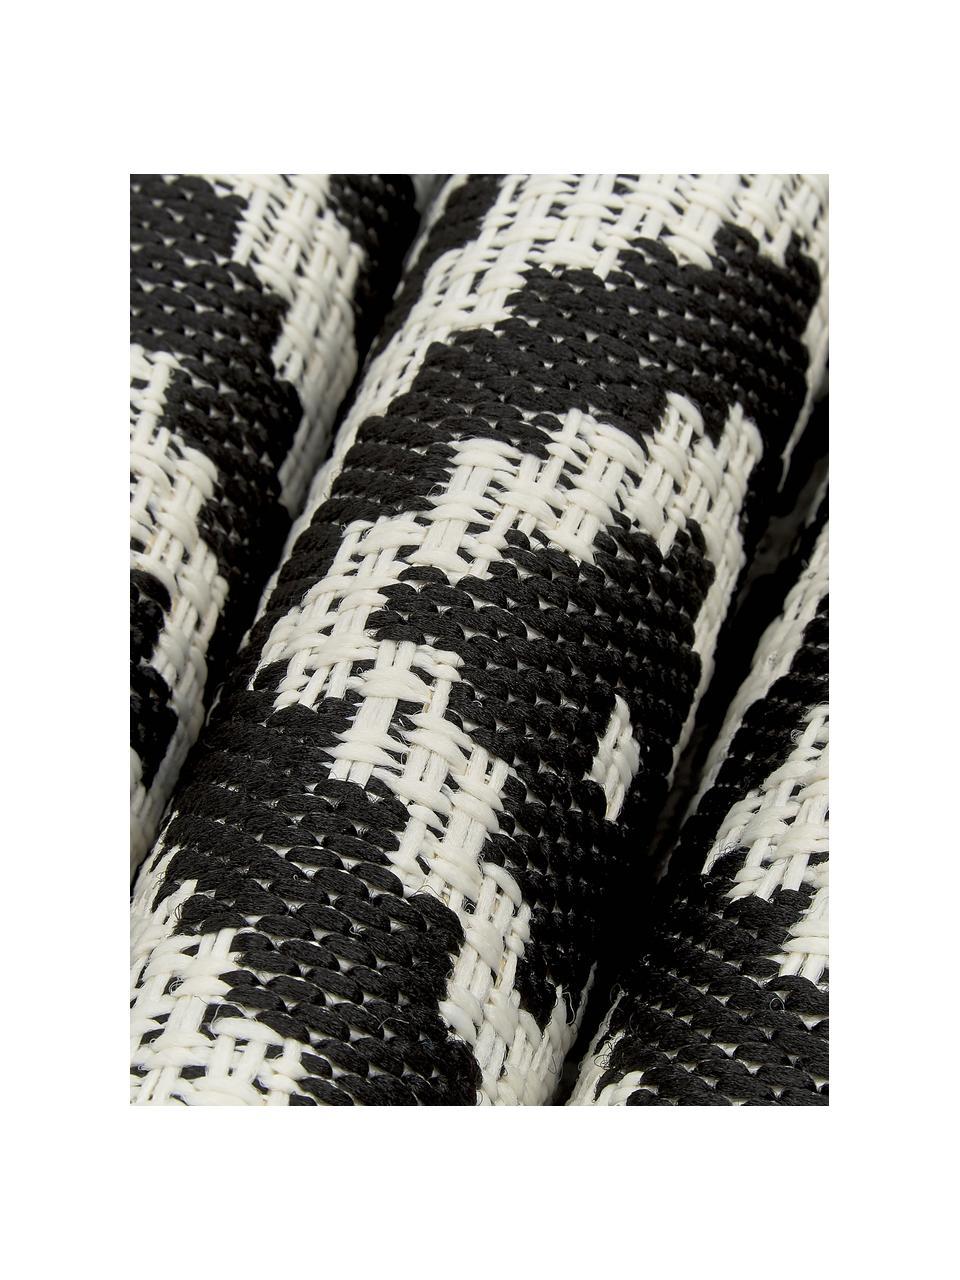 Passatoia fantasia nera/bianca da interno-esterno Miami, 86% polipropilene, 14% poliestere, Bianco crema, nero, Larg. 80 x Lung. 250 cm